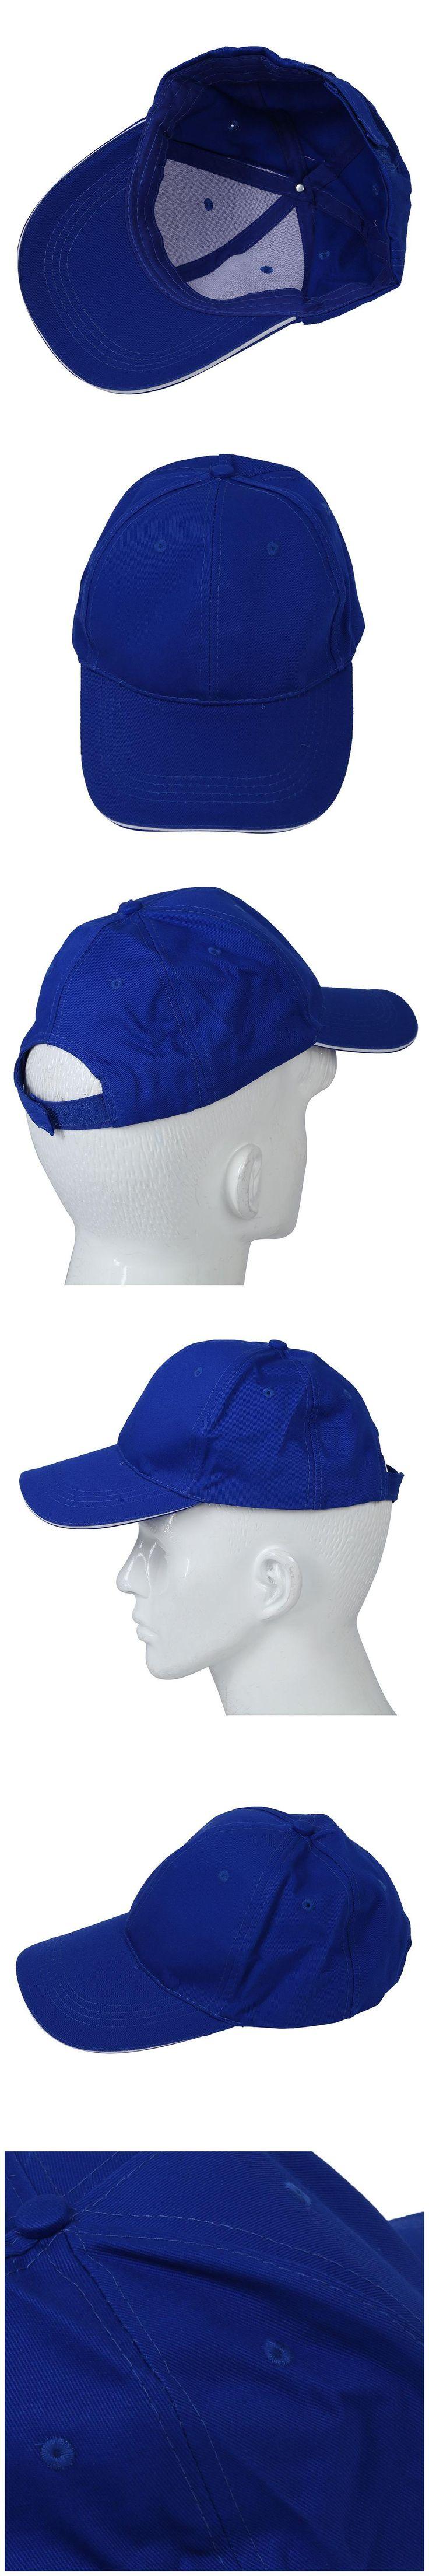 NEW Plain Baseball Cap Mens Ladies Adult Hat Summer-Deep blue